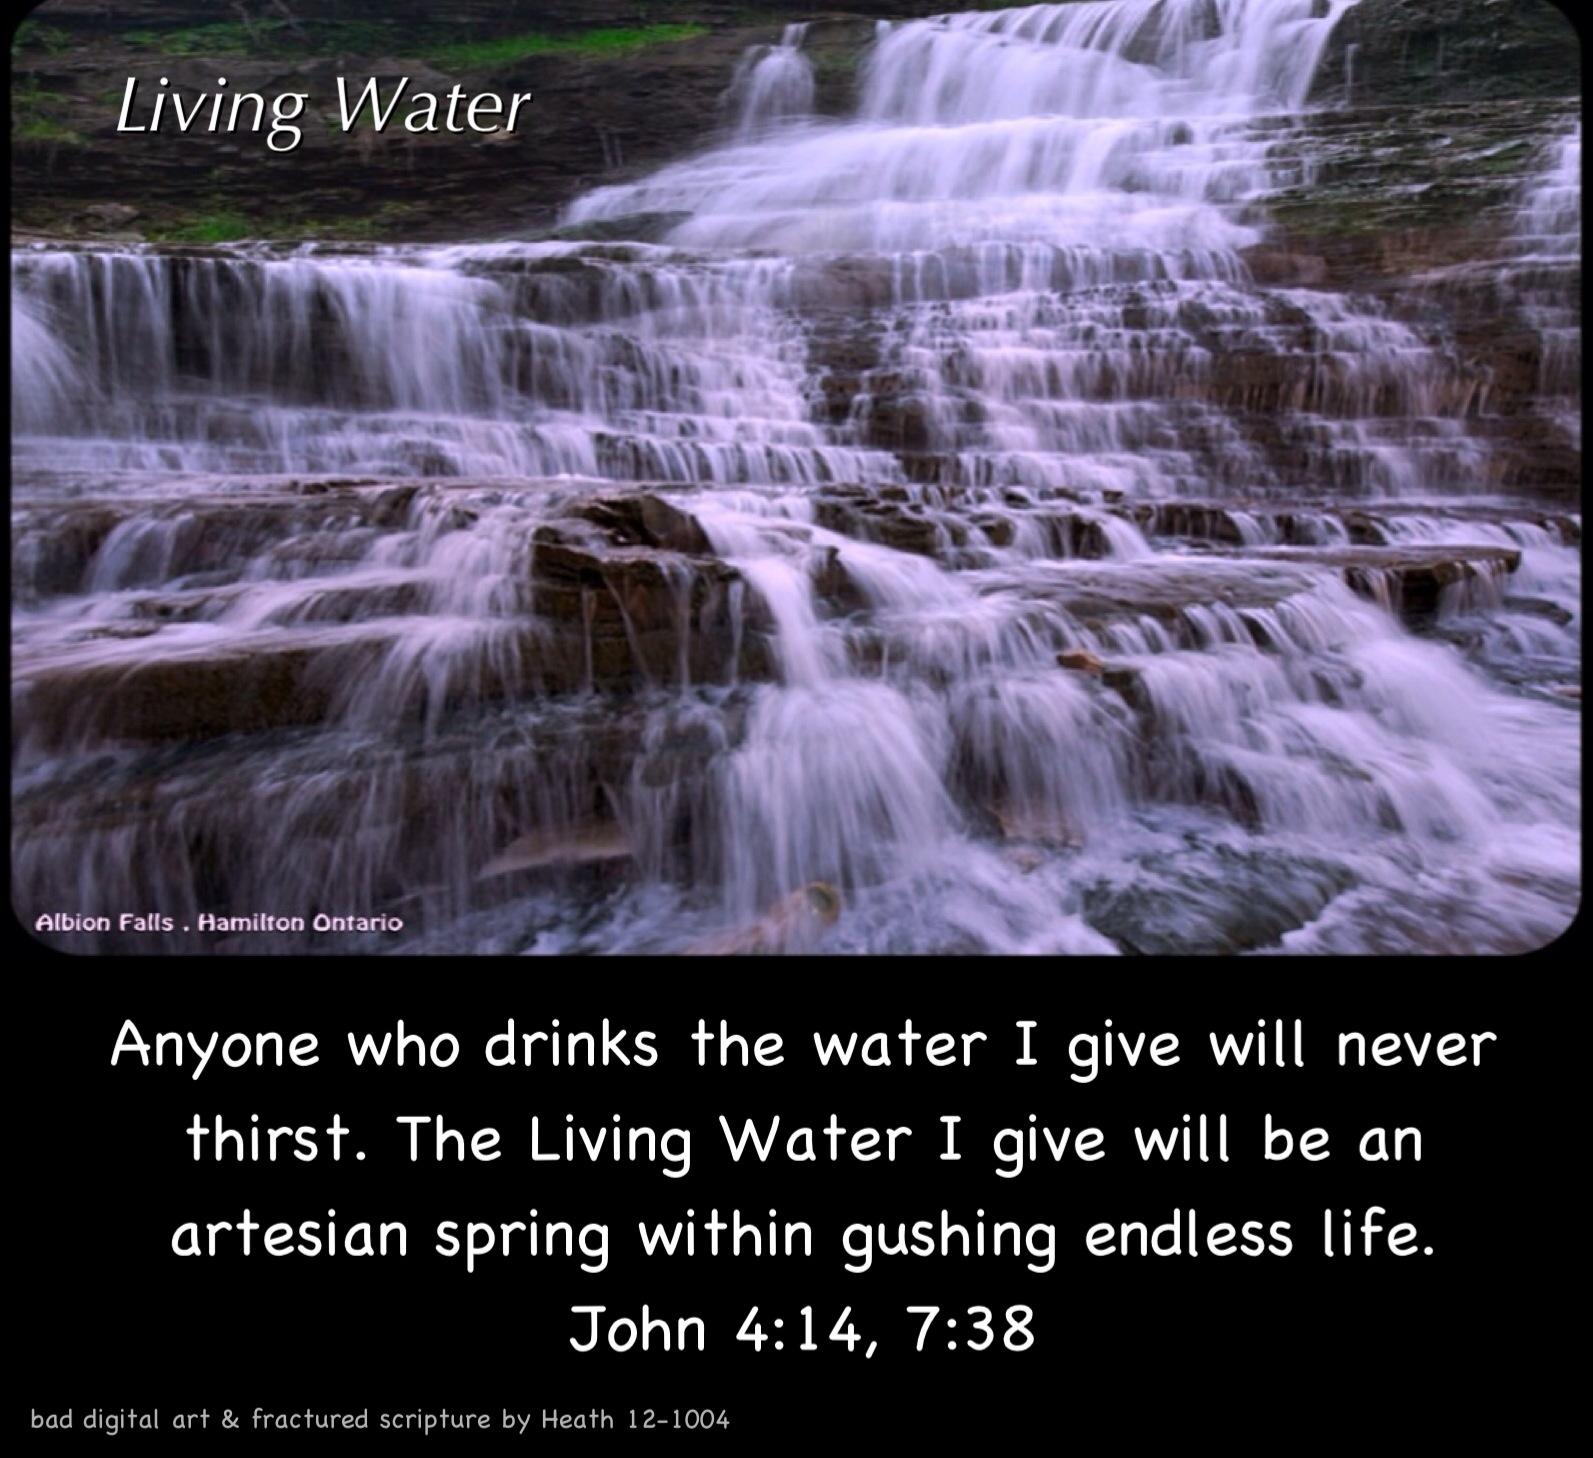 livingwater2